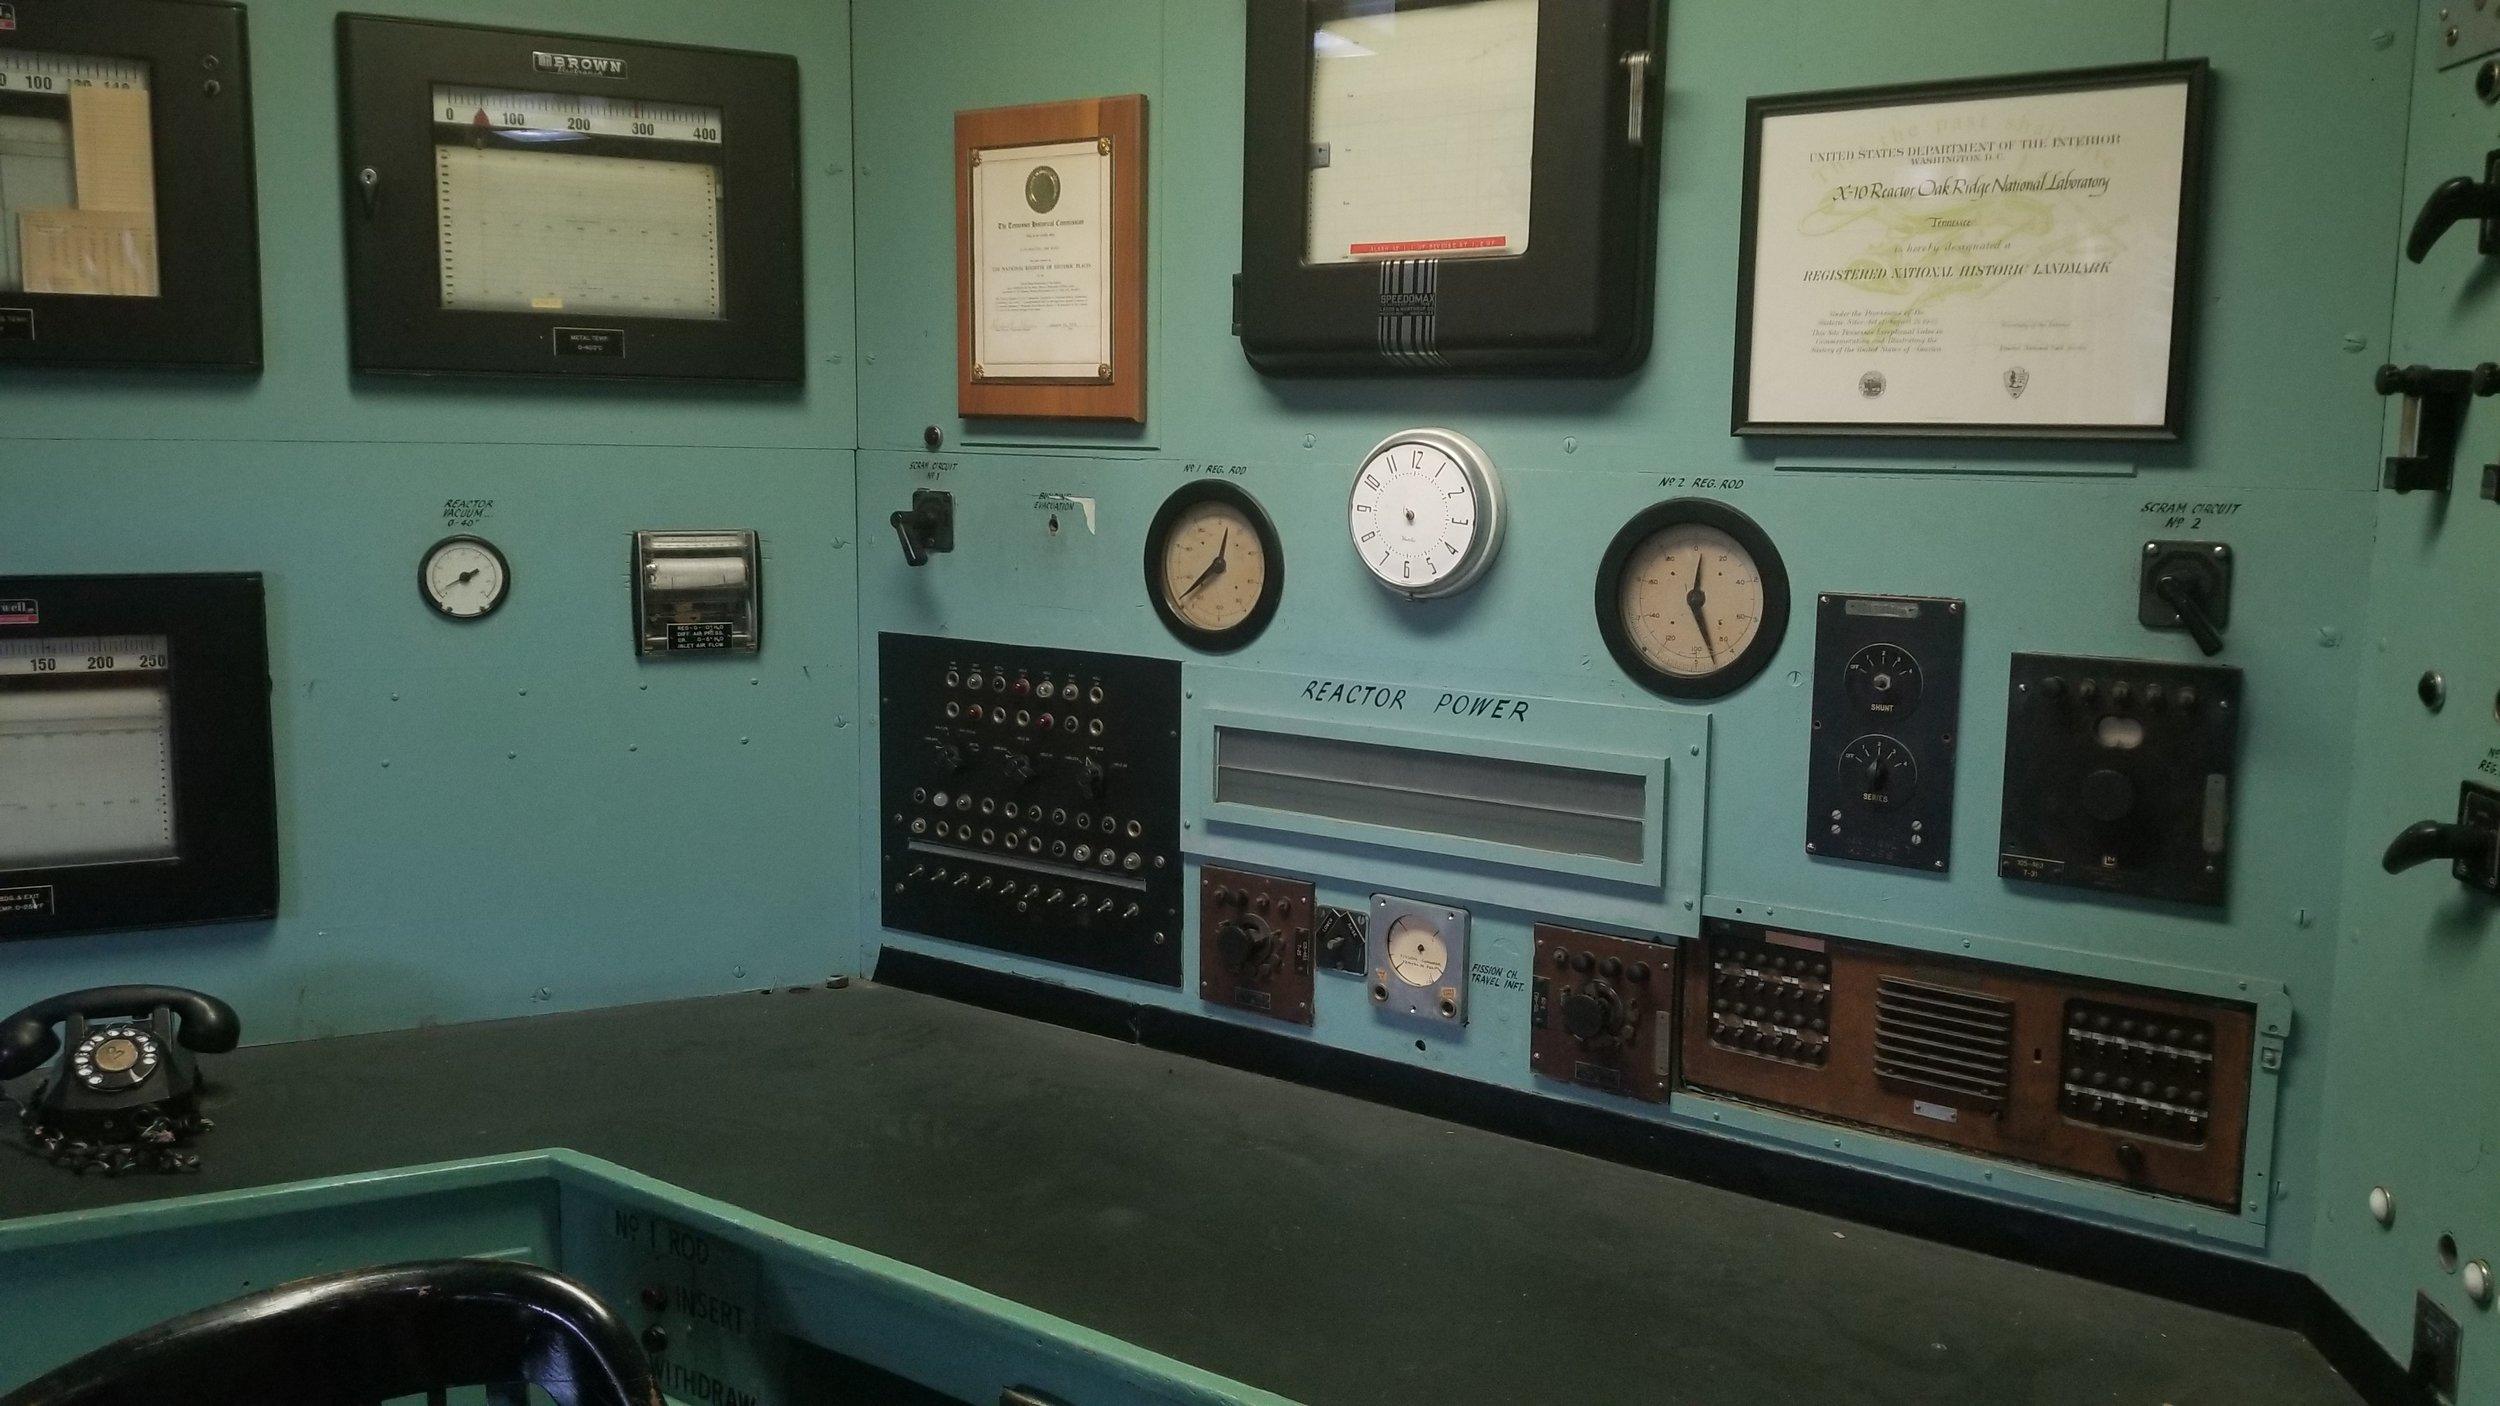 The Graphite Reactor Oak Ridge